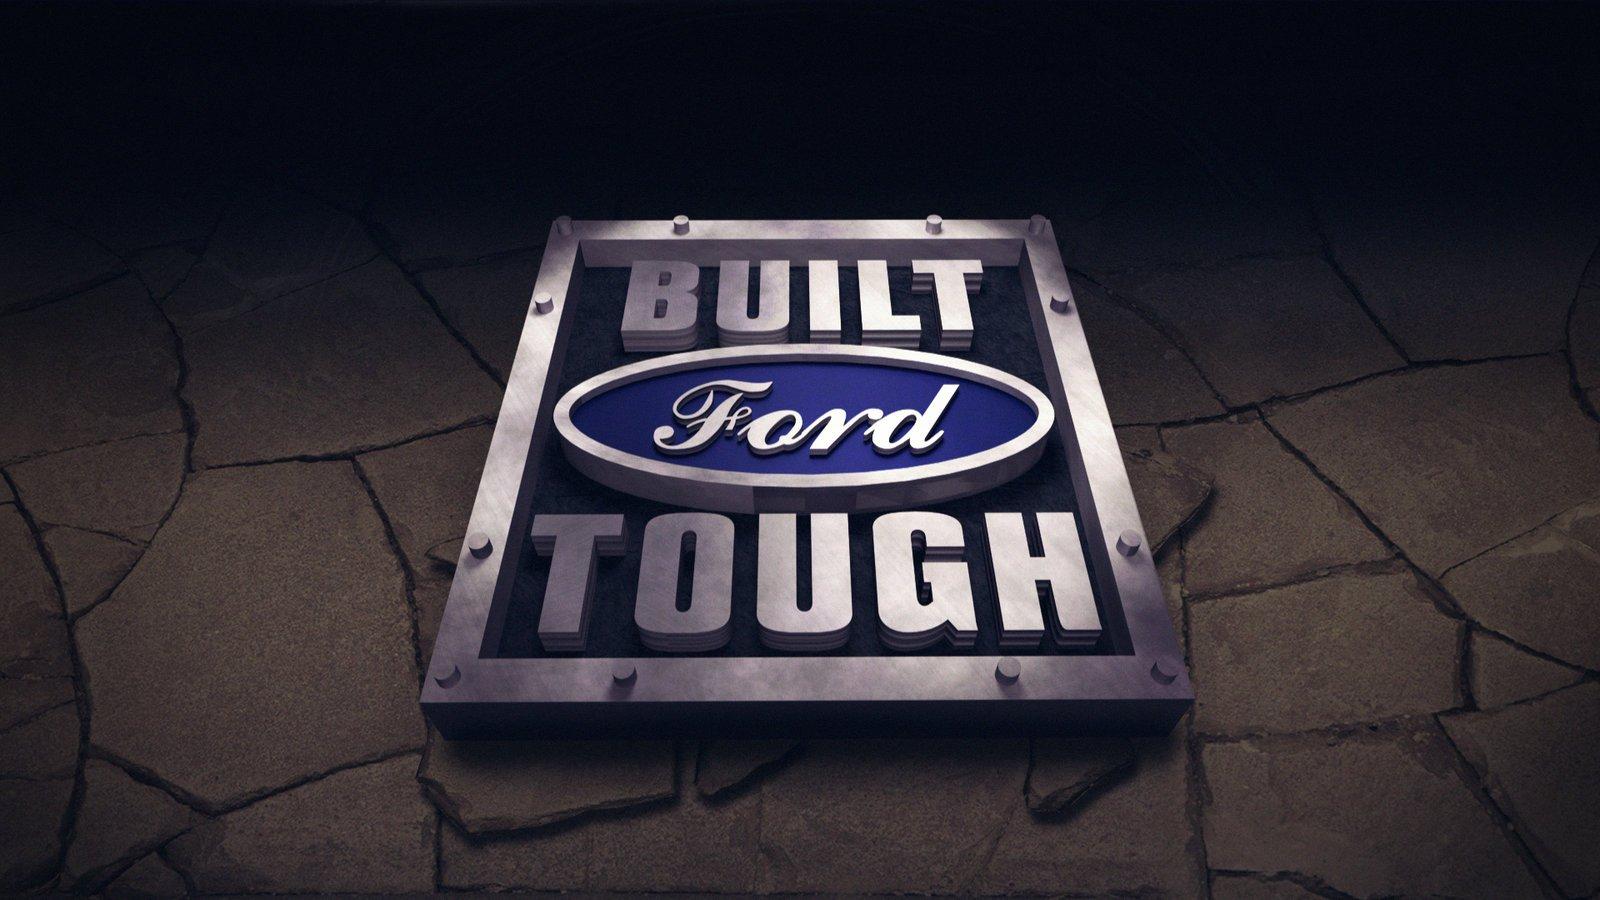 Built Ford Tough Wallpaper   image 71 1600x900